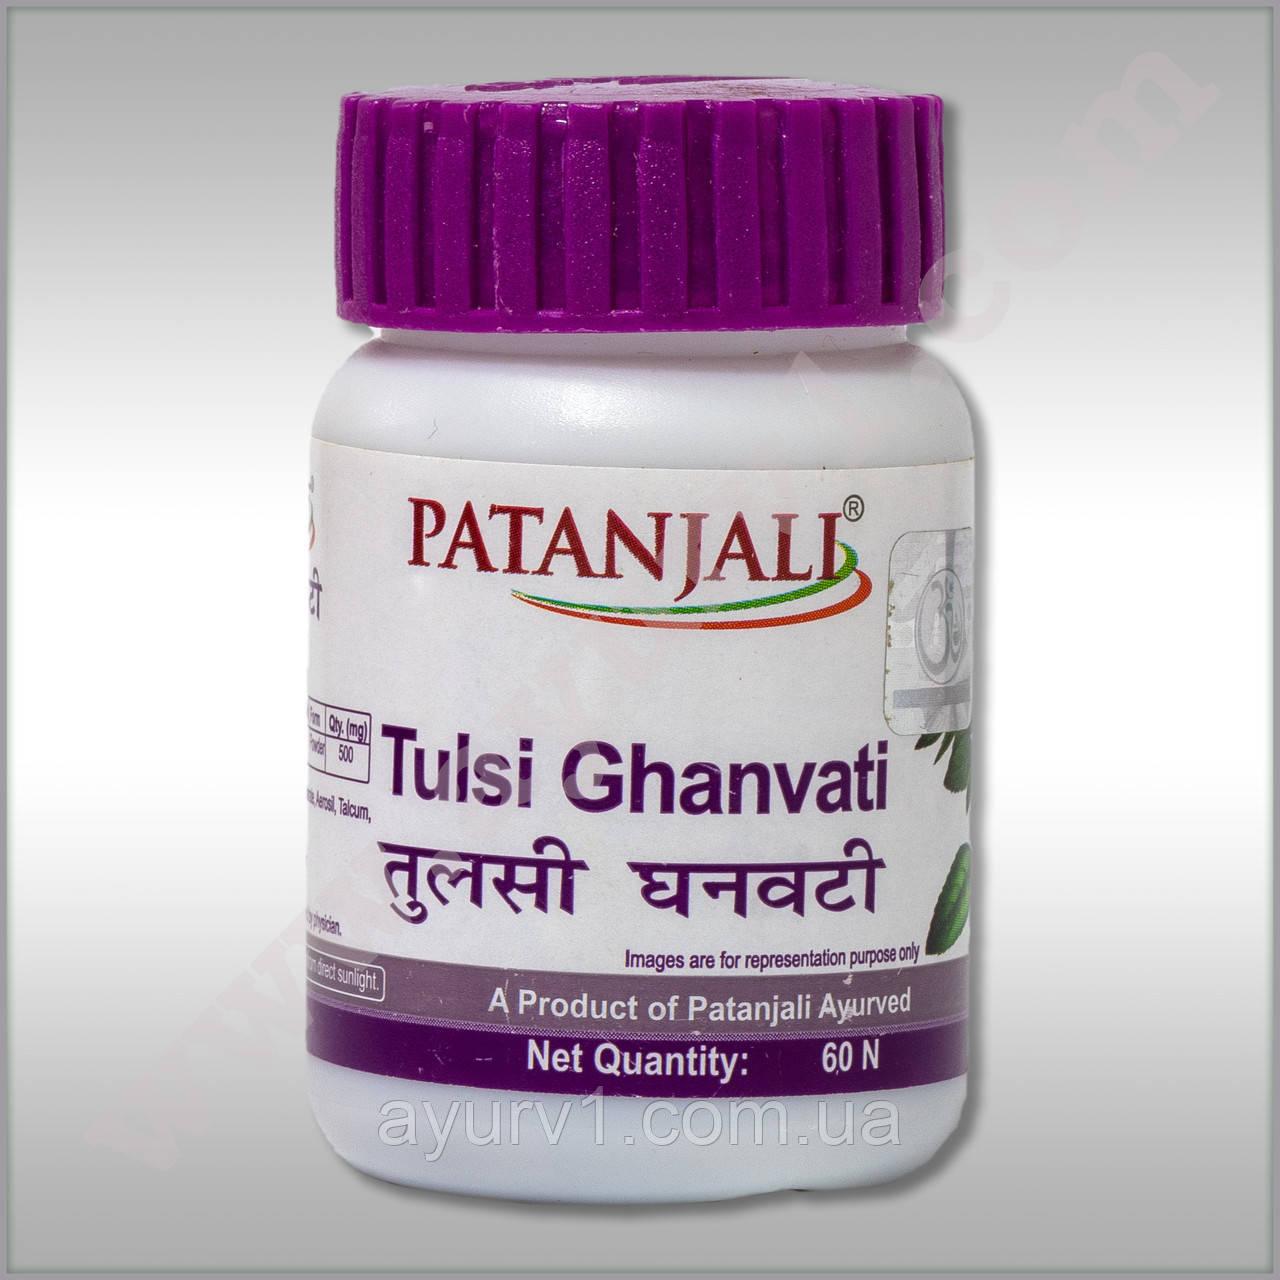 Тулси Гханвати- Патанжали, Tulsi Ghanvati Patanjali 60 tab